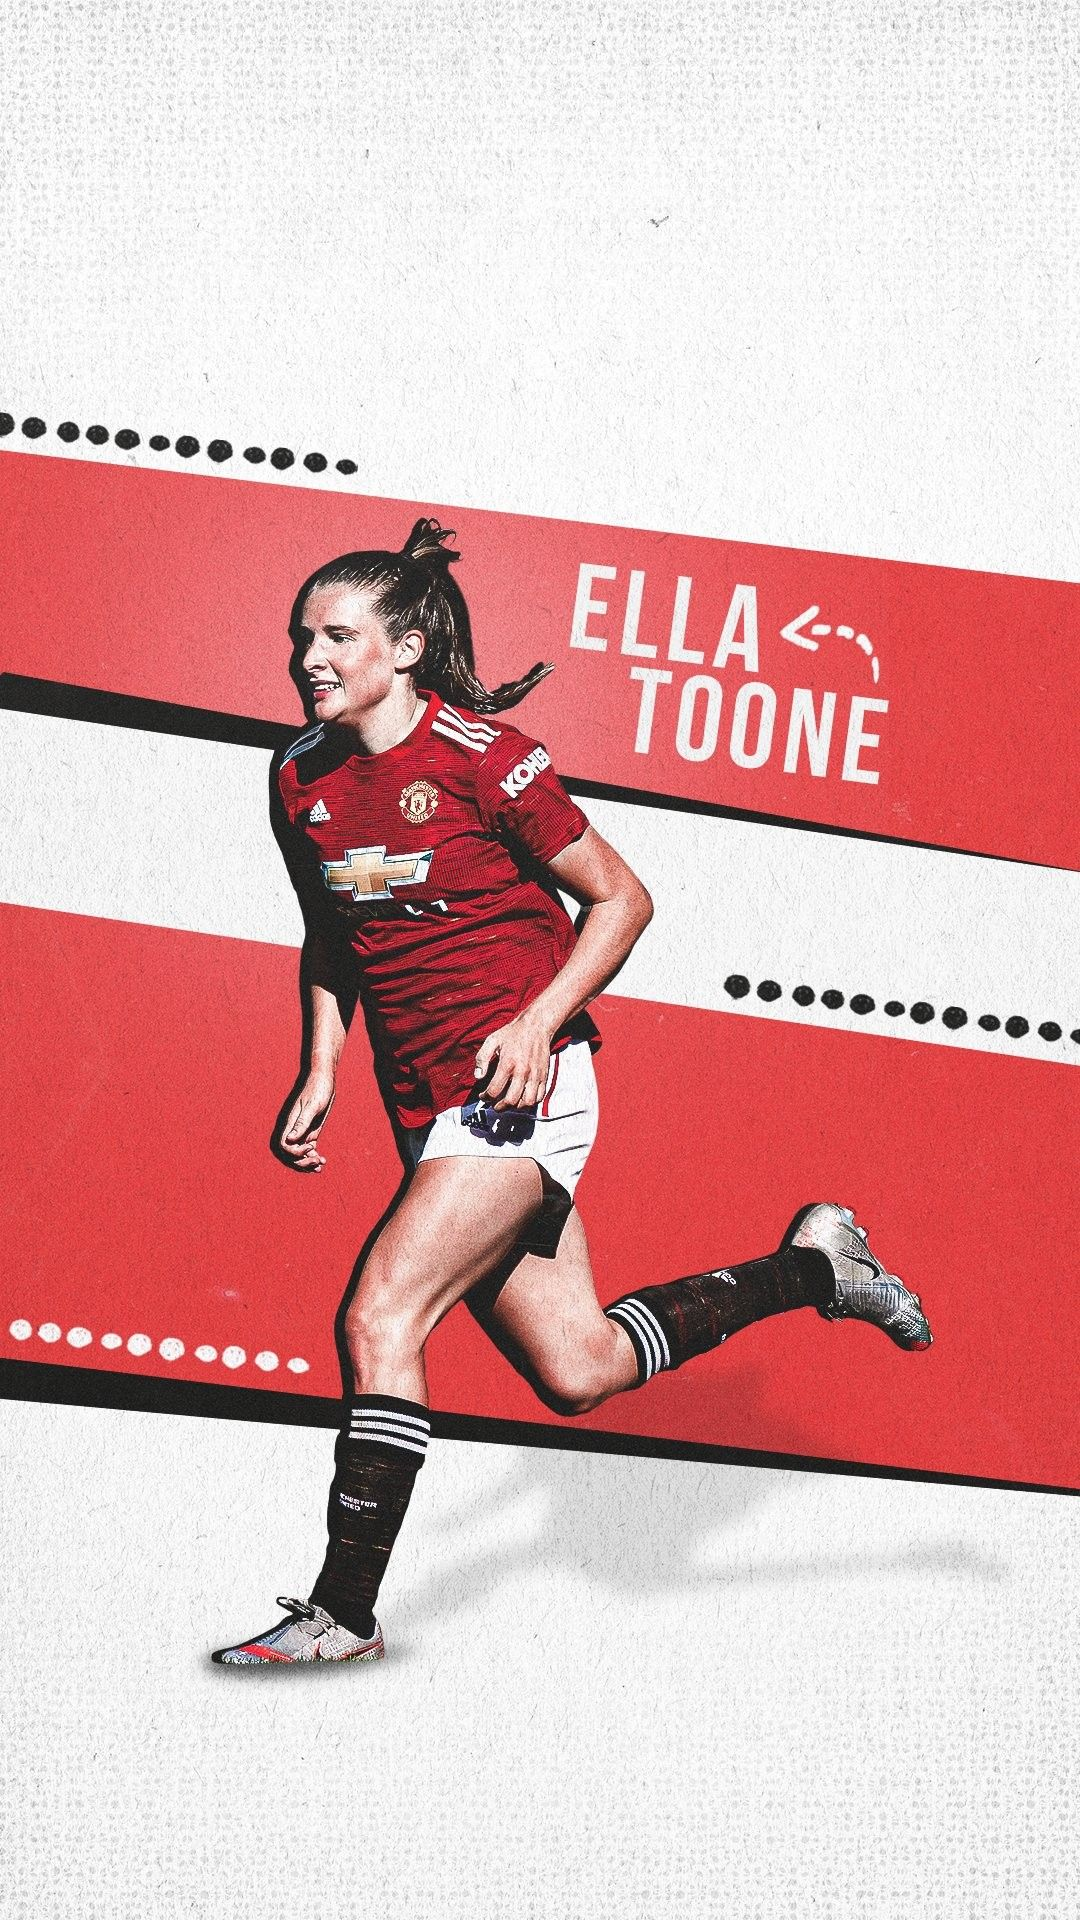 Ella Toone Wallpaper In 2021 Womens Football Wonder Woman Superhero